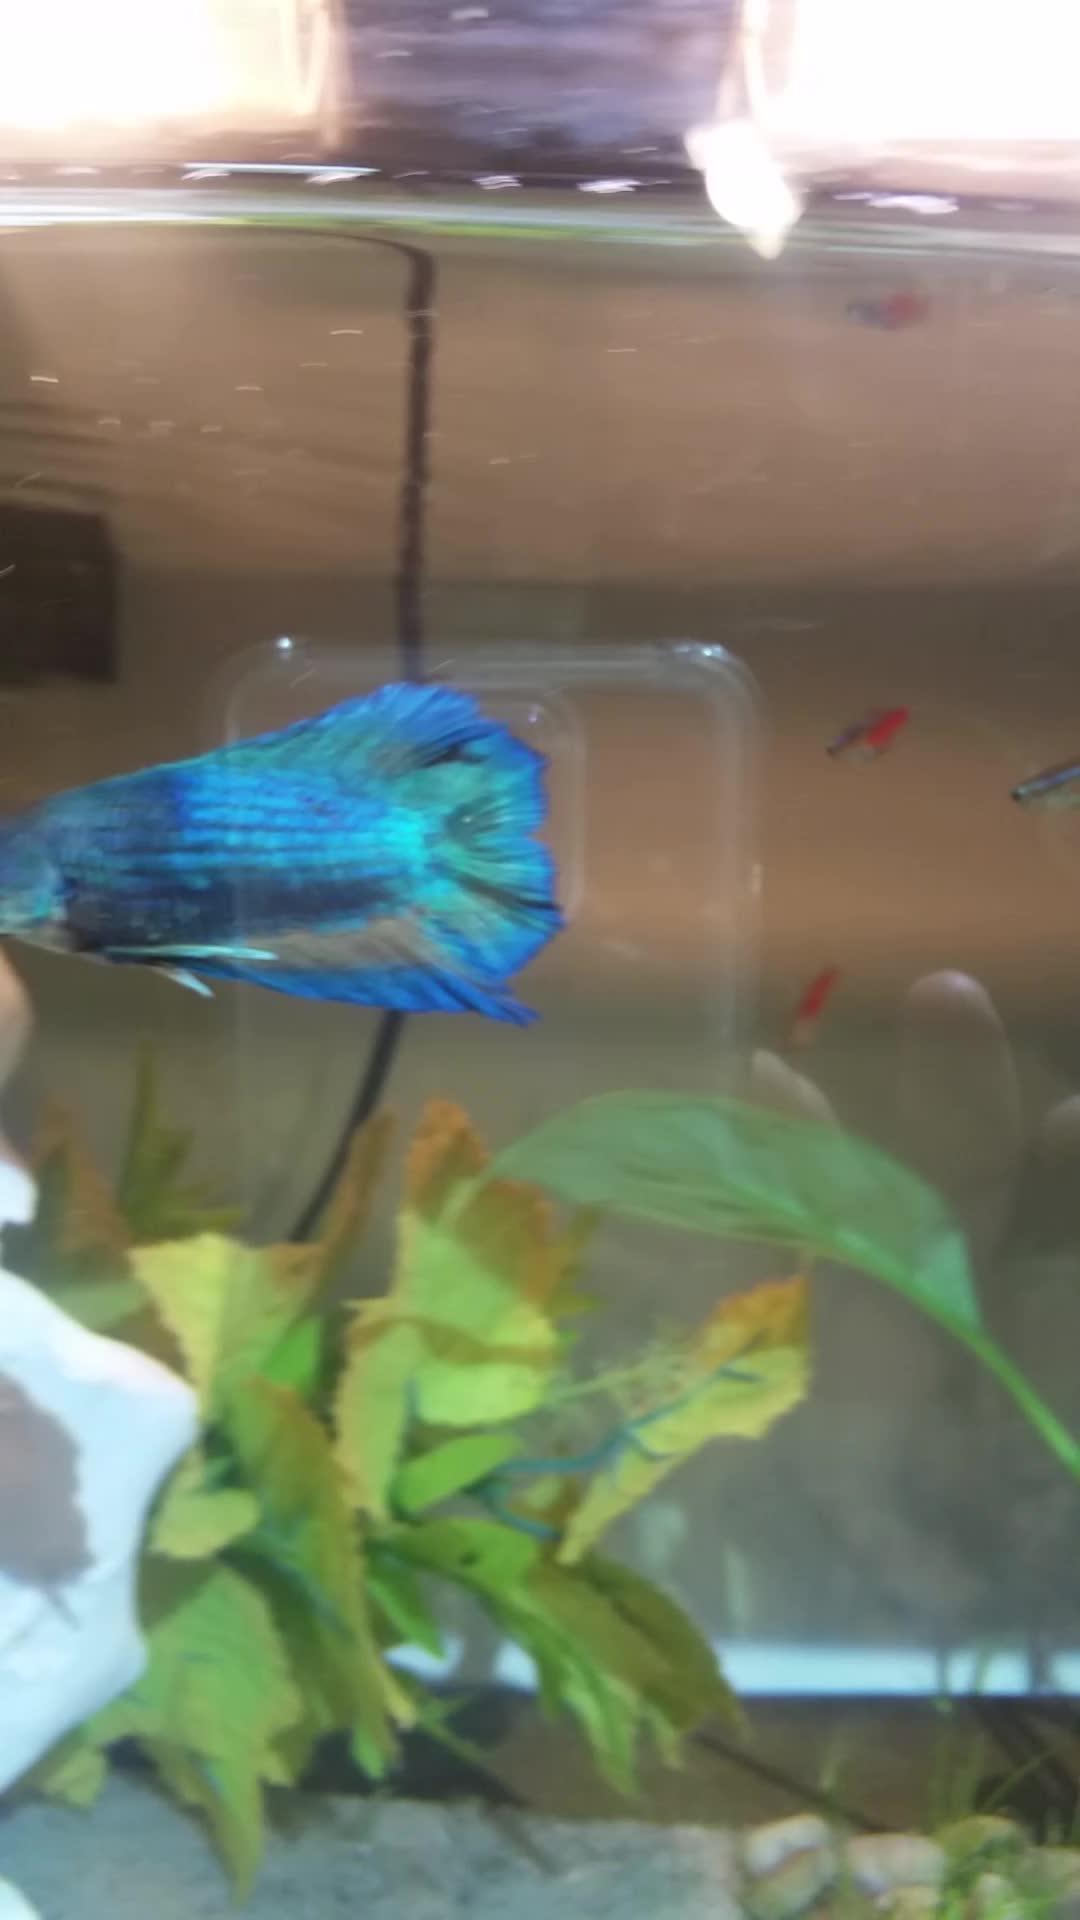 bettafish, My new betta GIFs